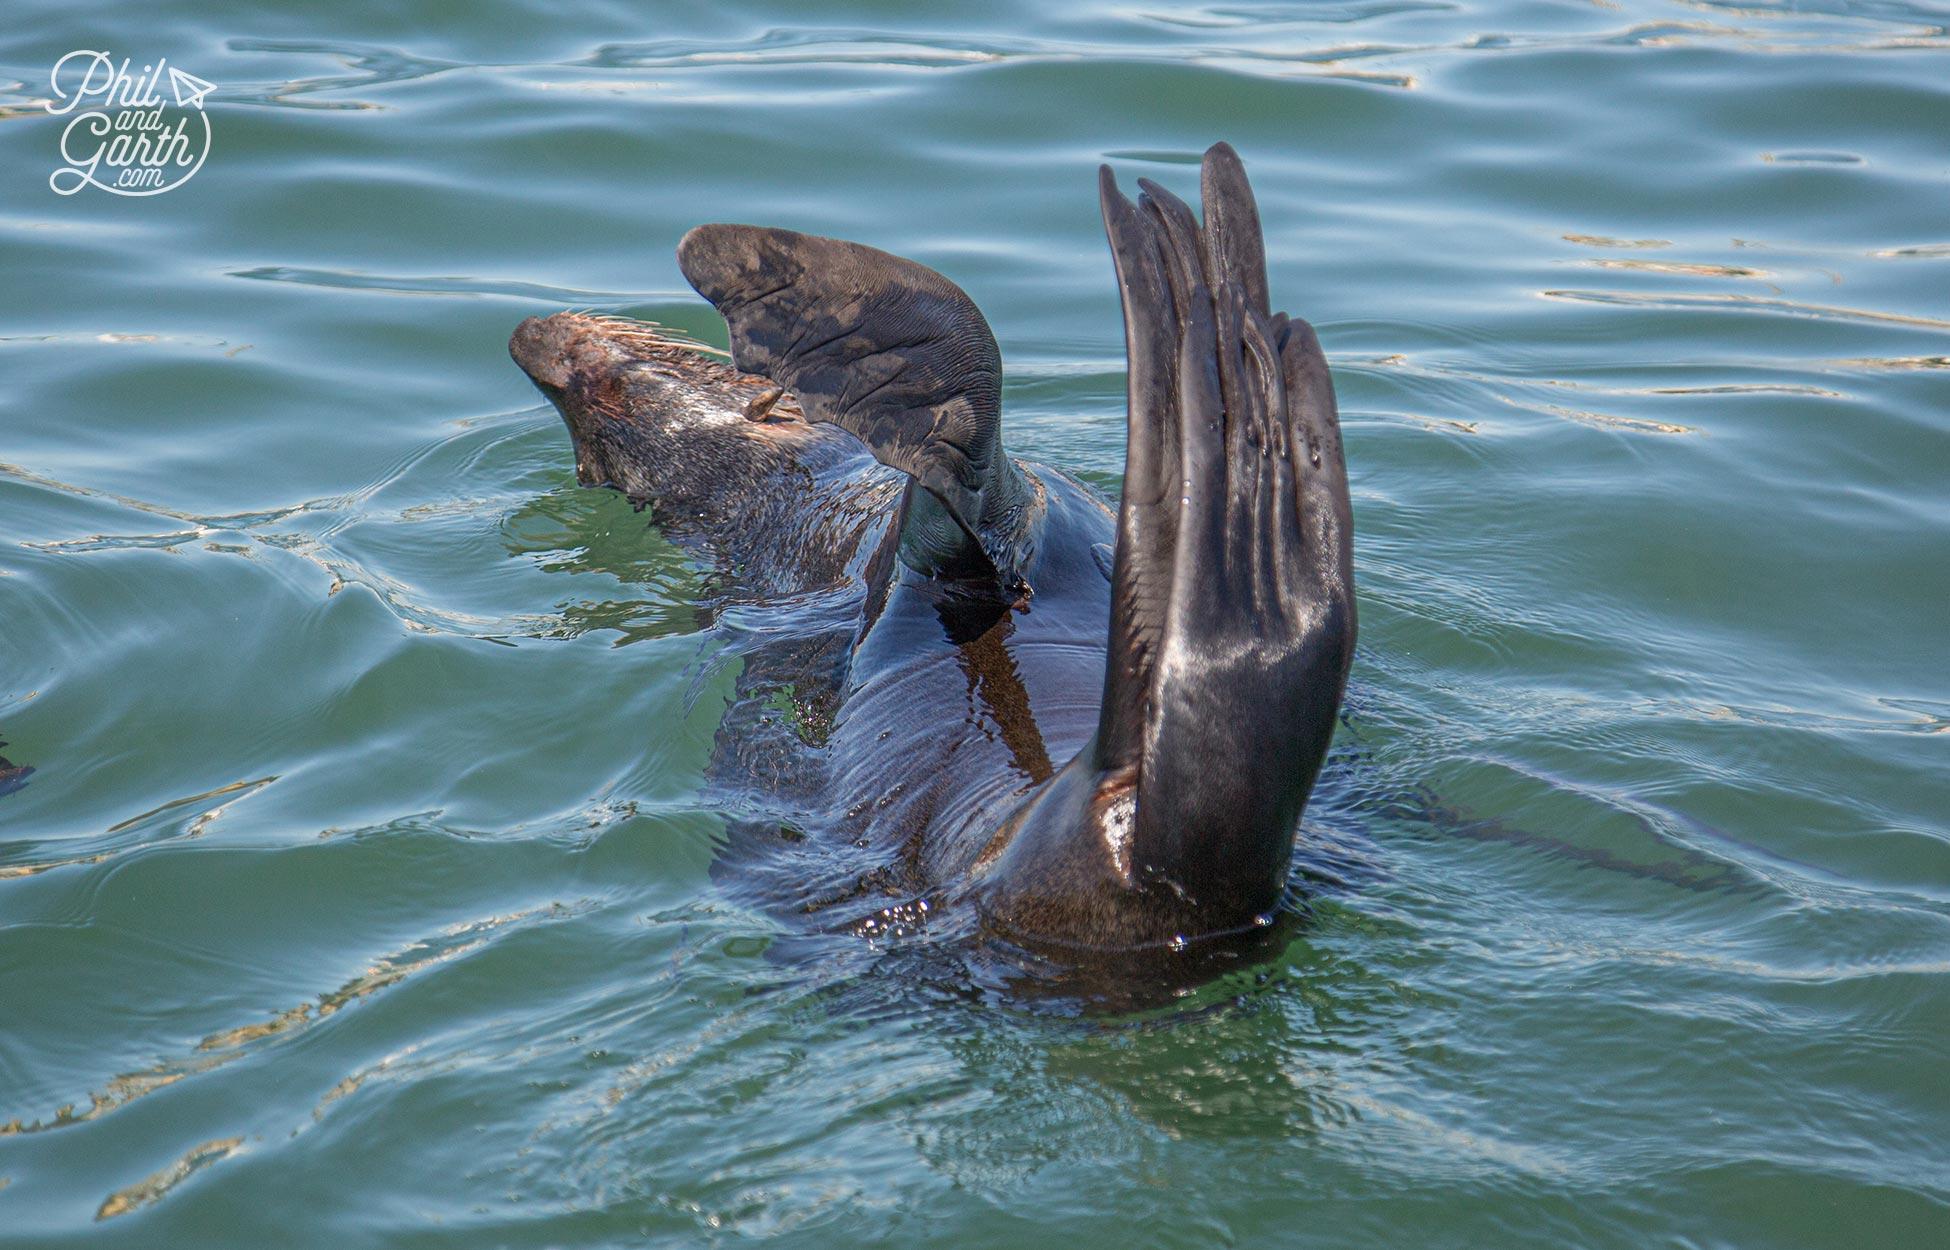 Seals having fun in the harbour water